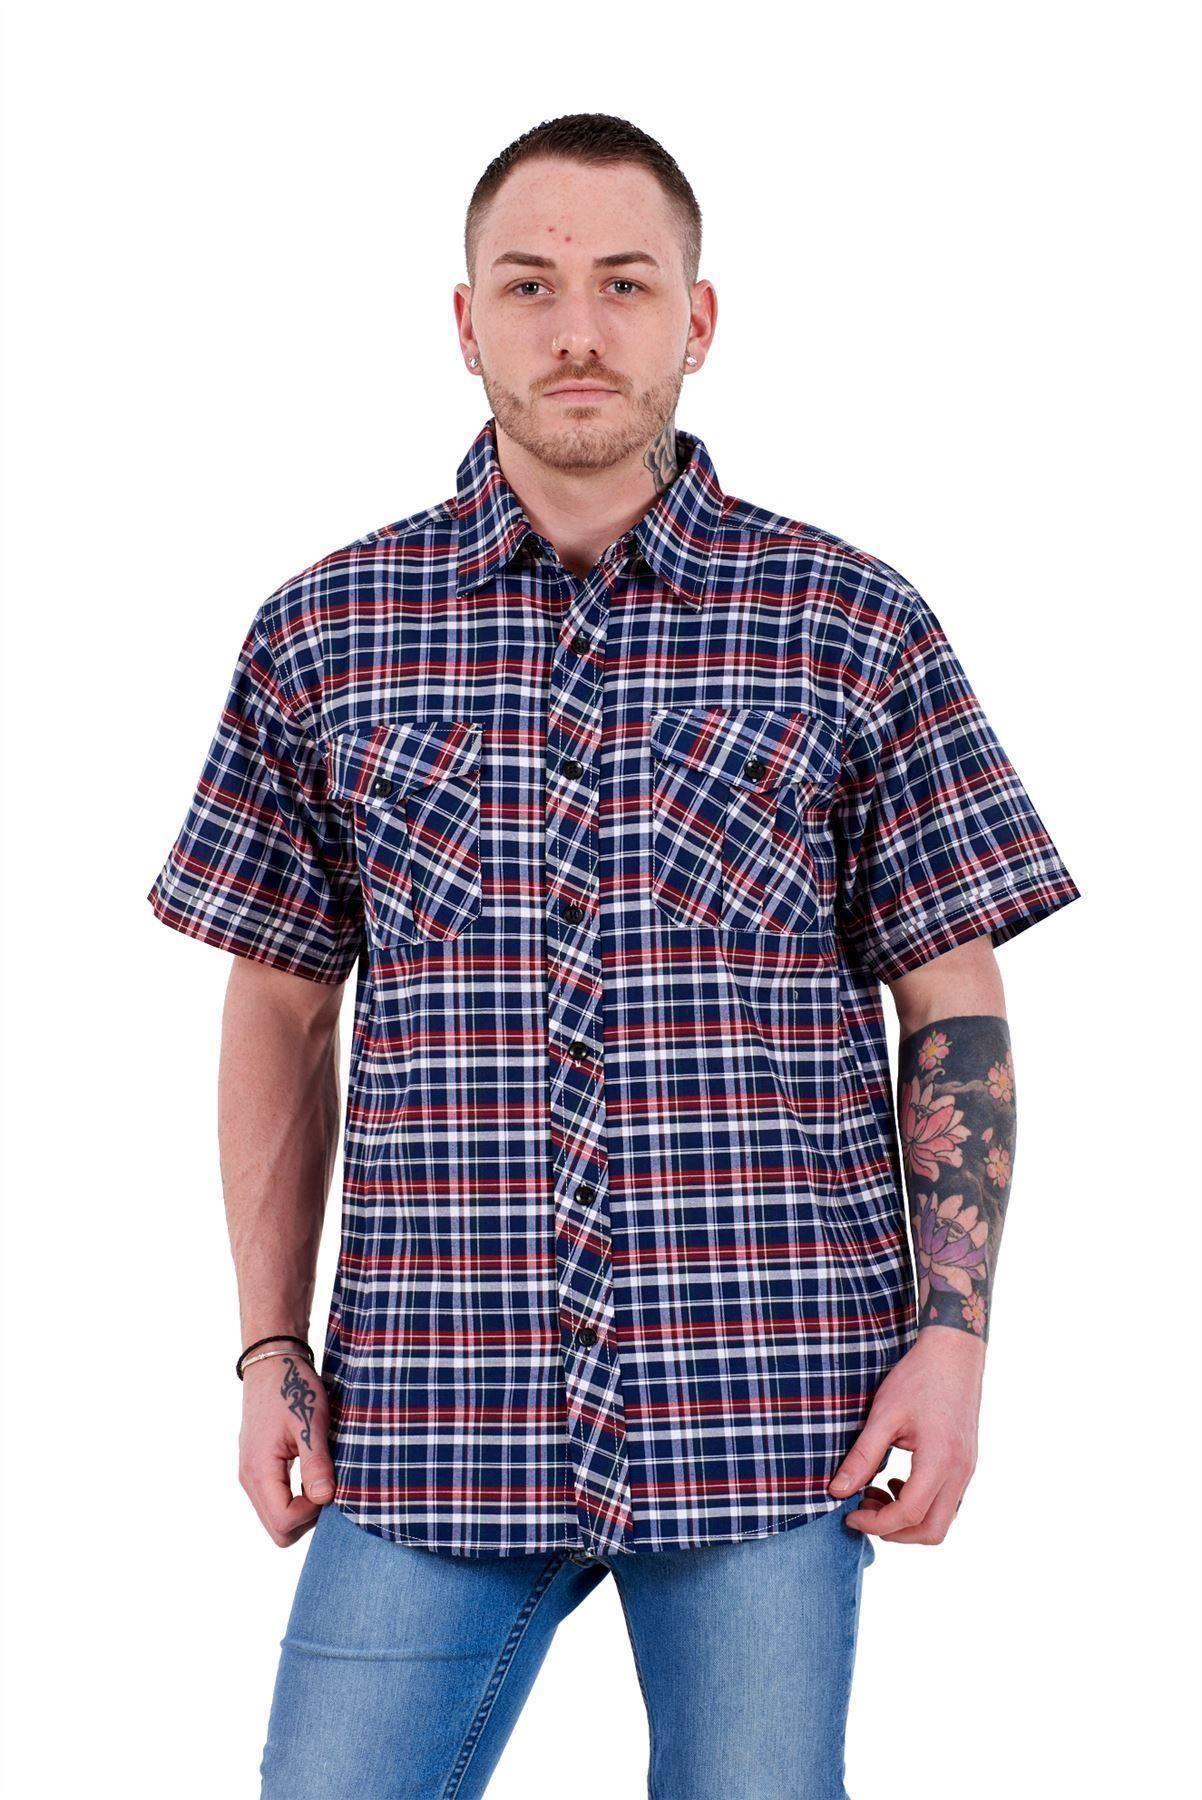 Mens-Regular-Big-Size-Shirts-Checked-Cotton-Blend-Casual-Short-Sleeve-M-to-5XL thumbnail 19